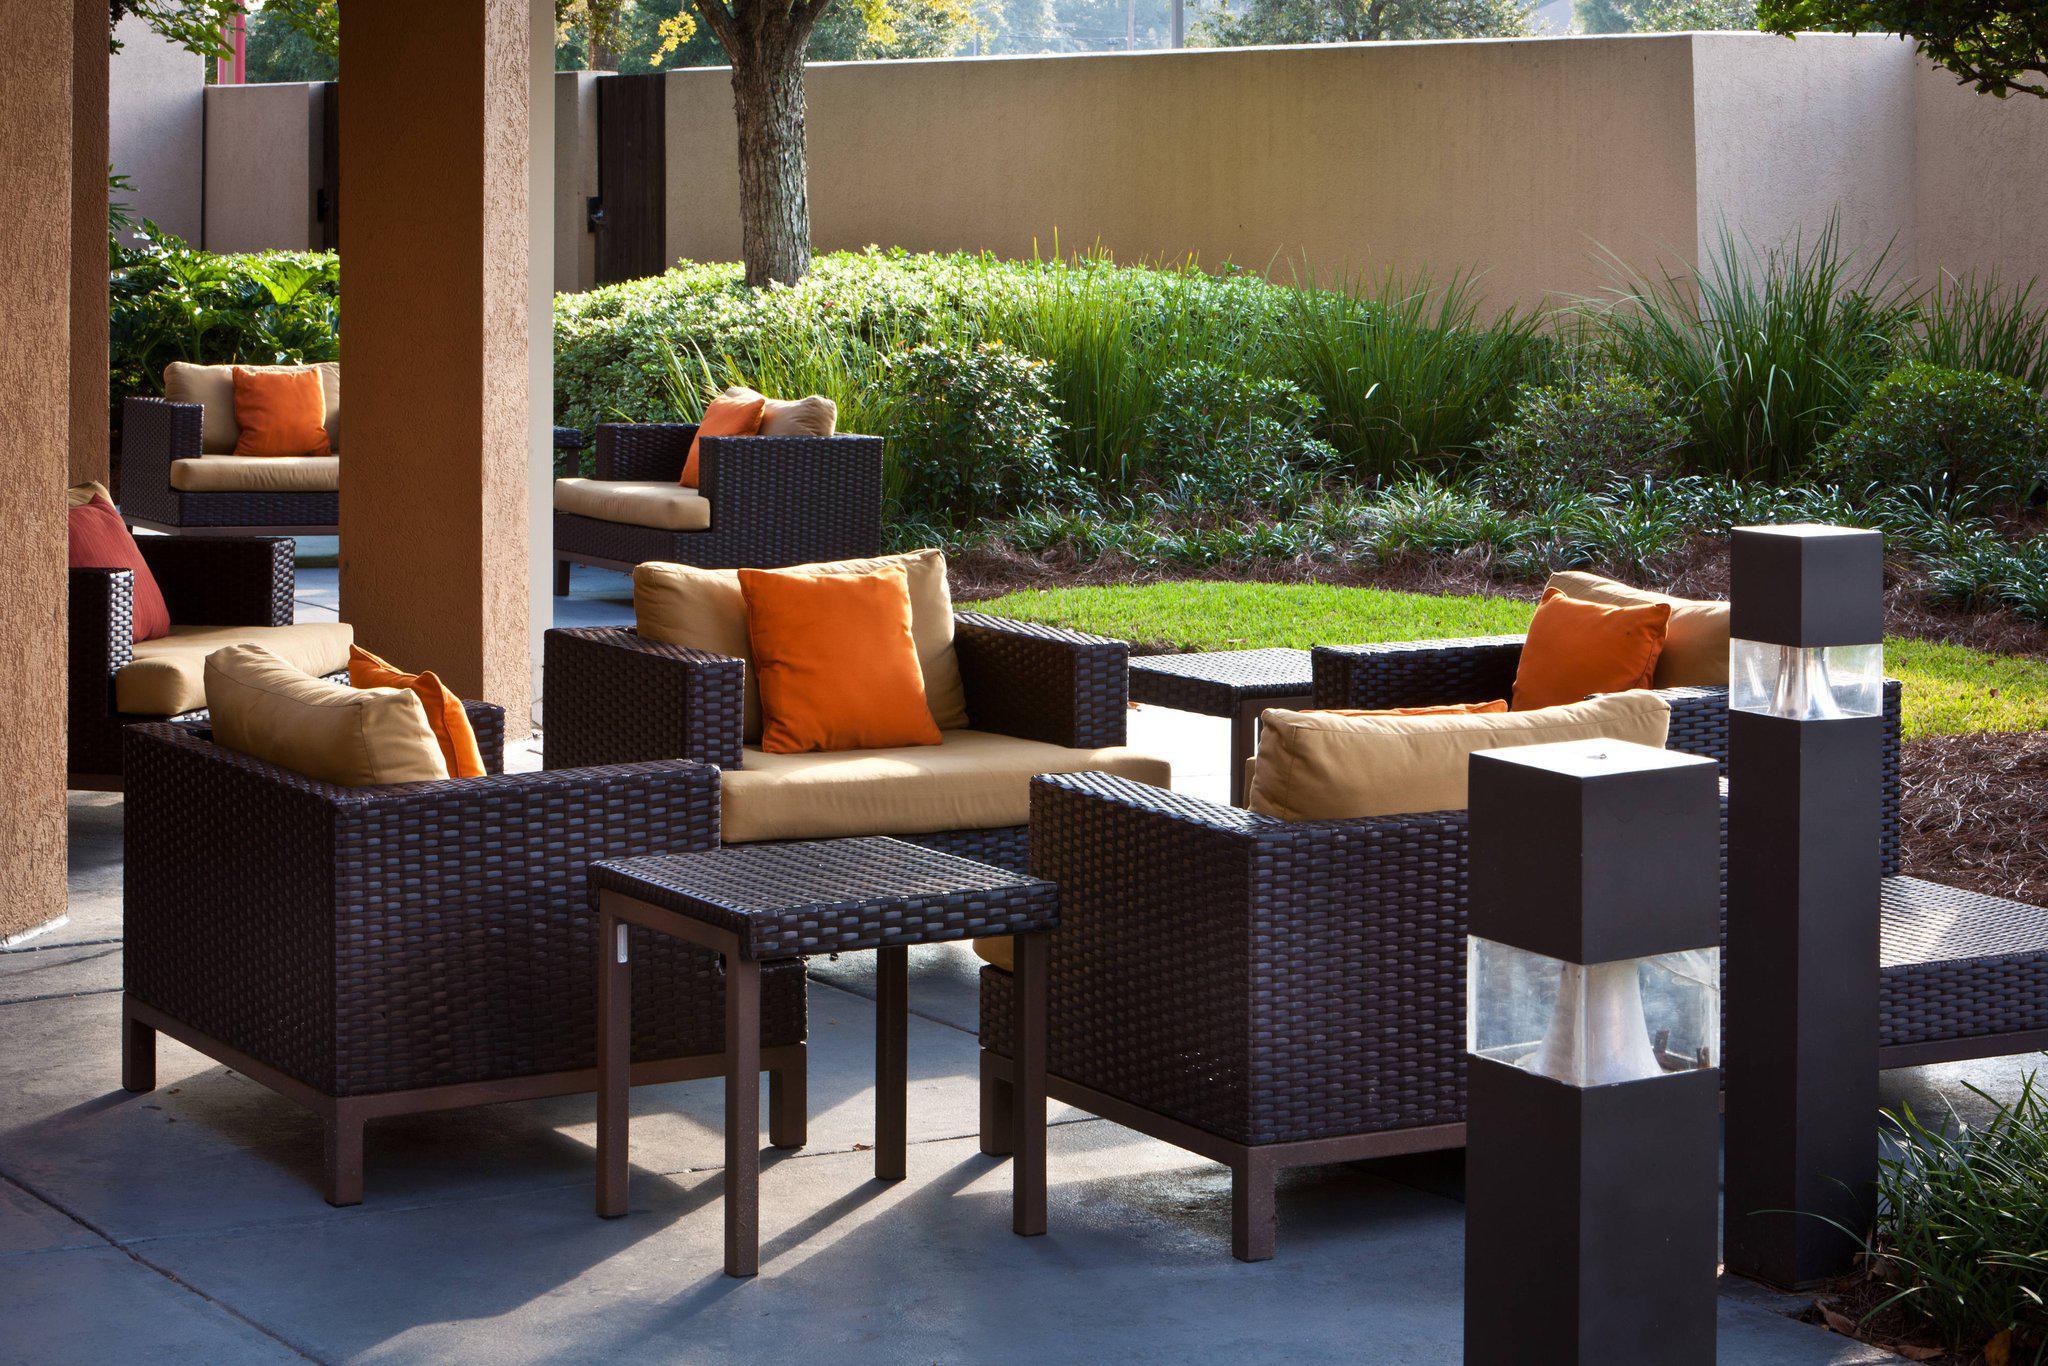 Courtyard by Marriott Baton Rouge Siegen Lane